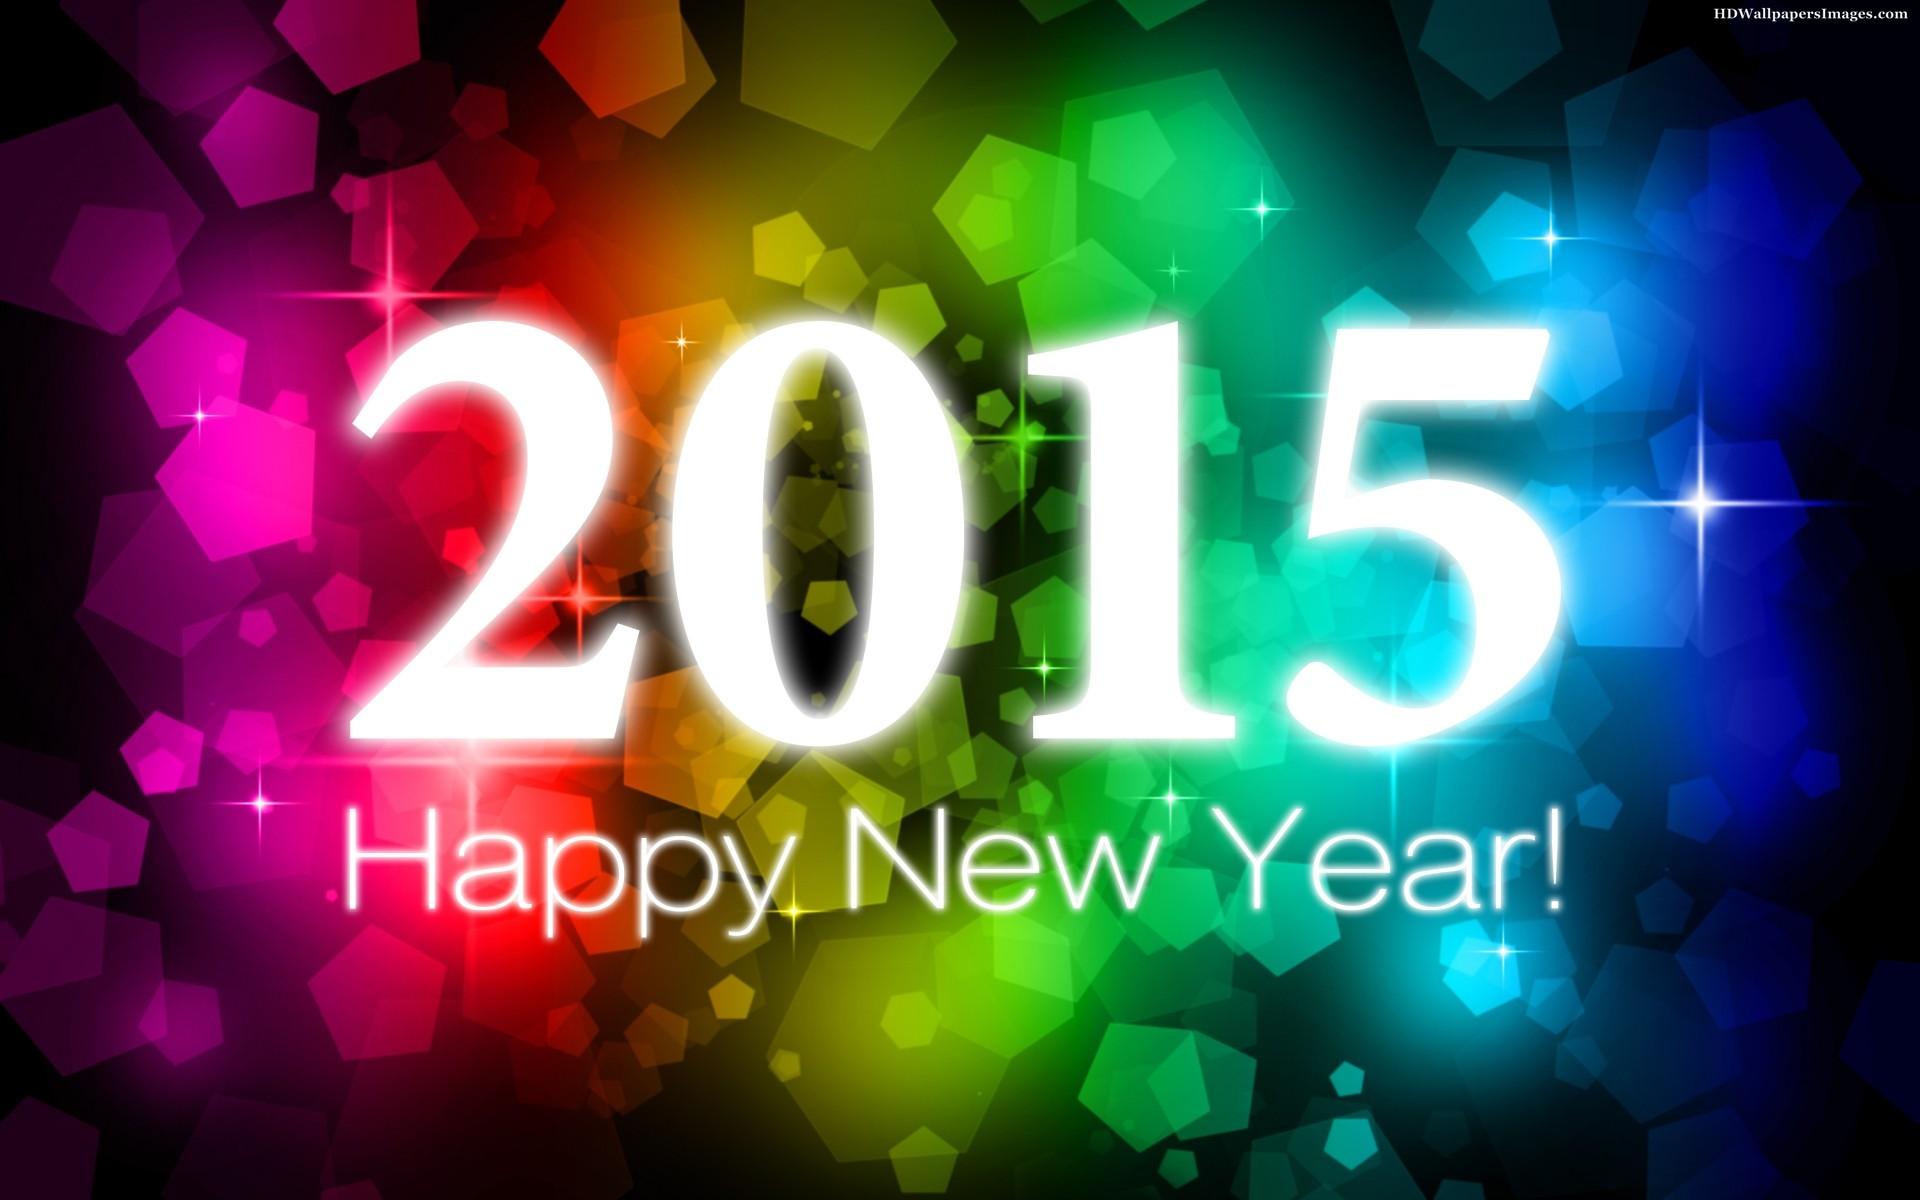 Happy New Year 2015Wallpapers for Desktop 42 1920x1200